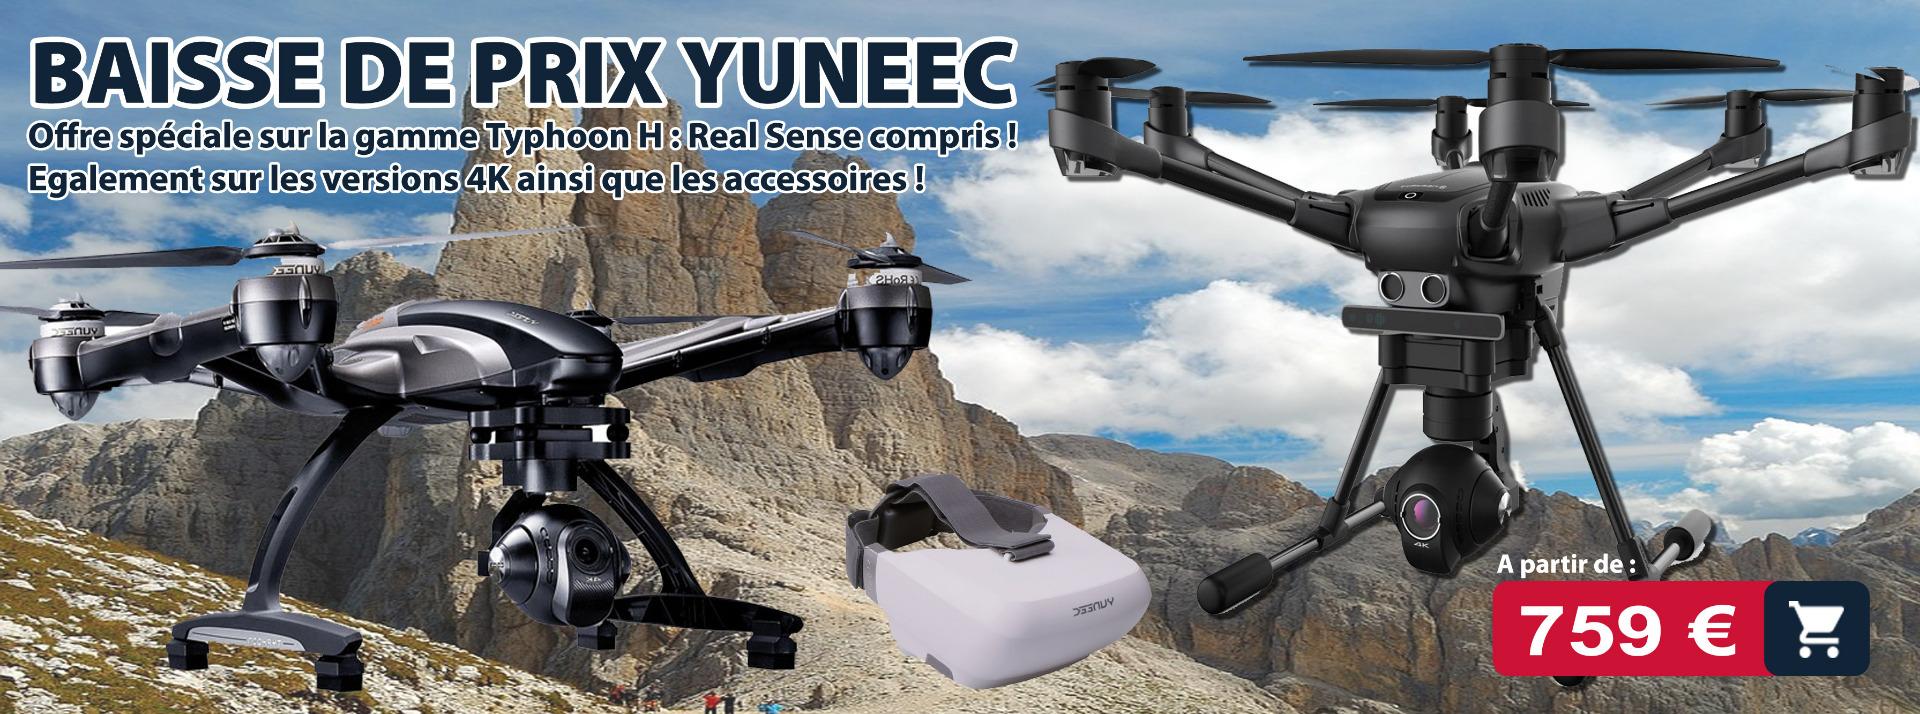 Drone Yuneec : typhoon H, Typhoon 4K avec radicommande et retour image